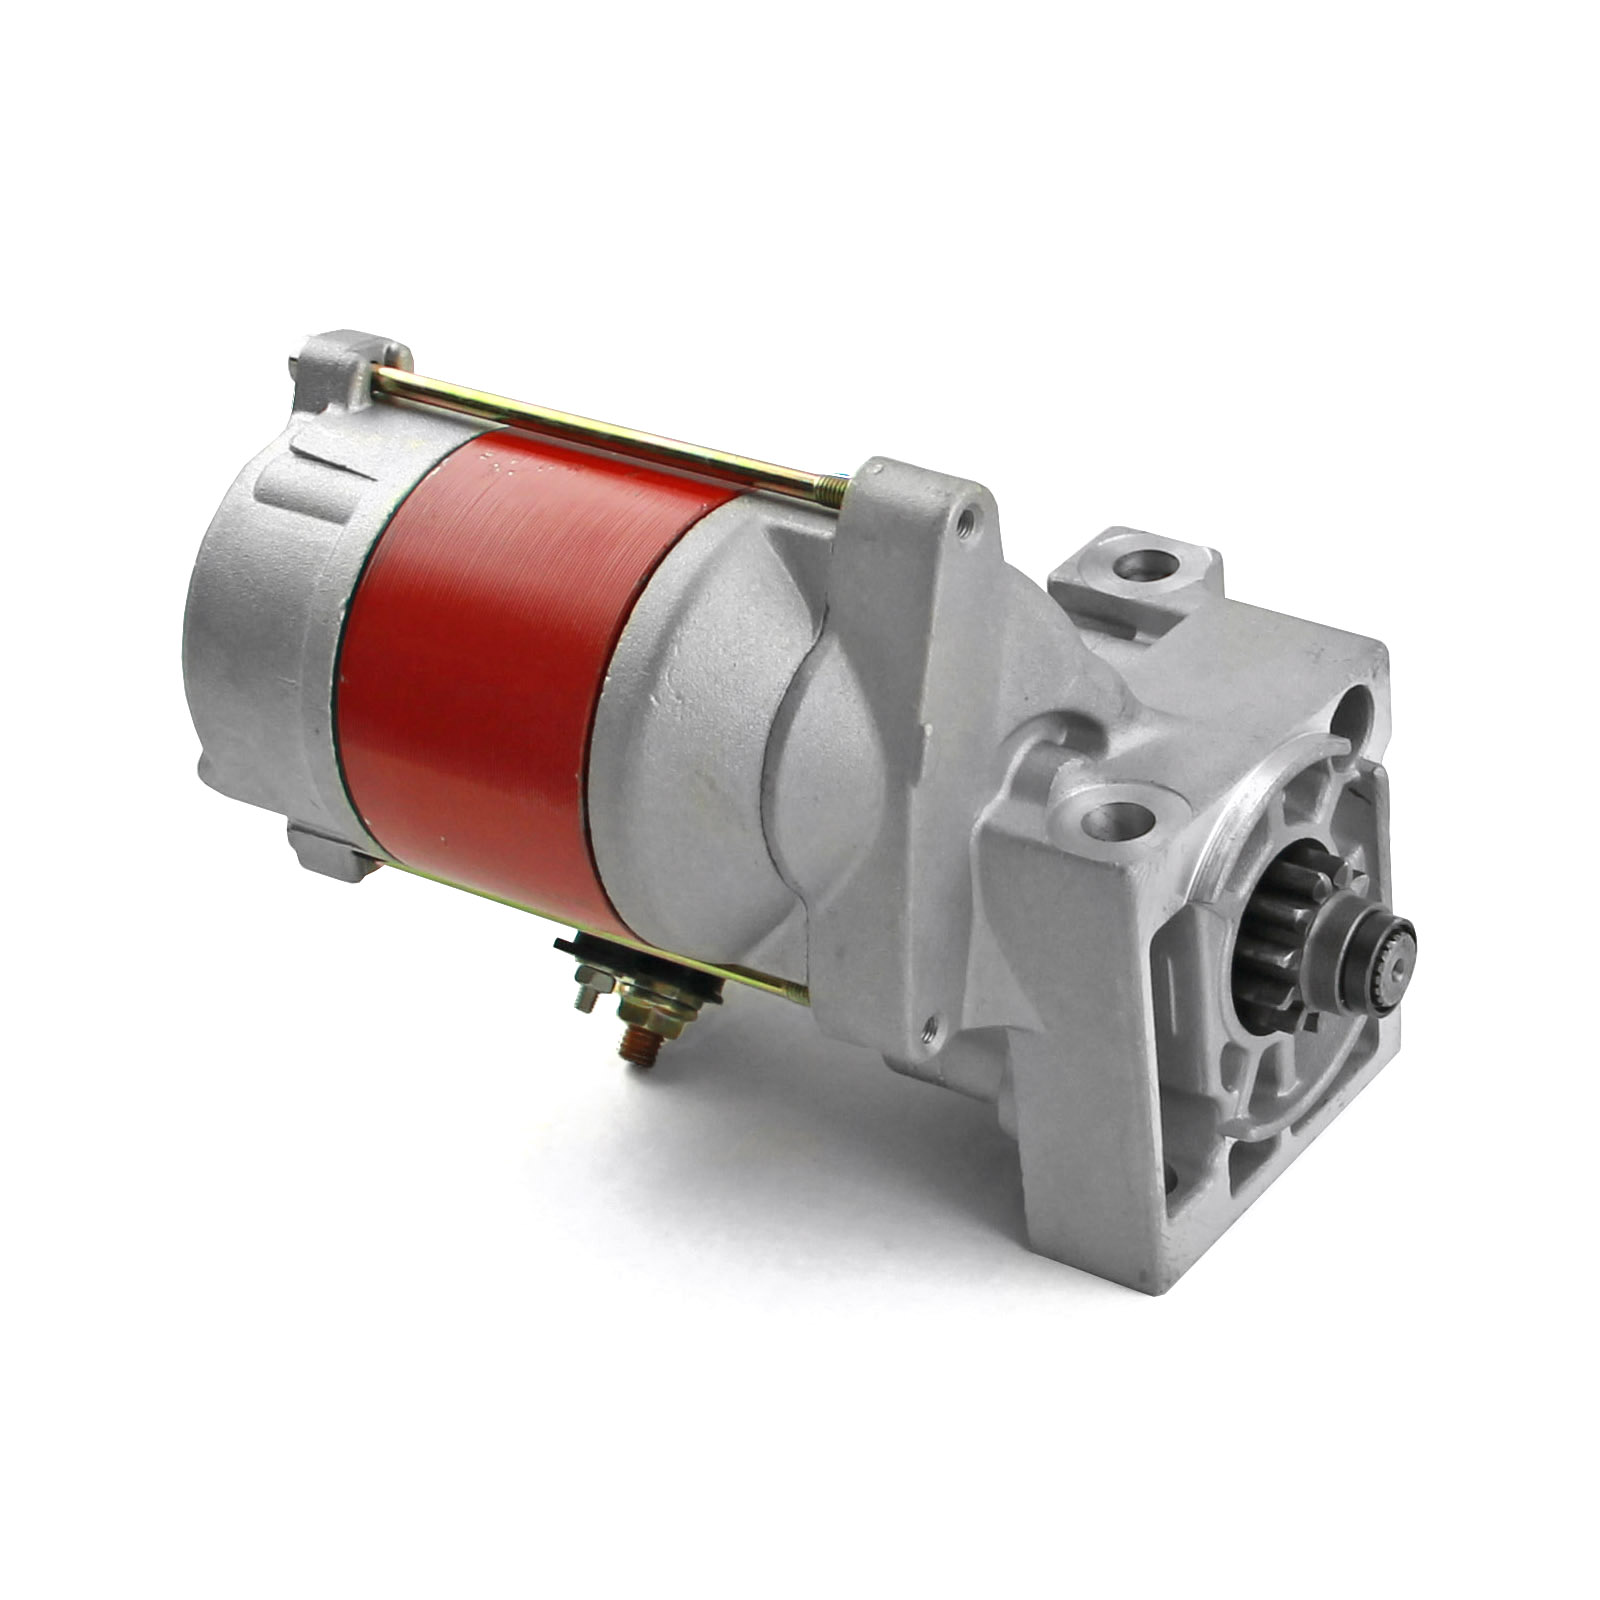 "Chevy SBC 350 BBC 454 11"" 168T Offset 2.5Hp High Torque Starter Motor Red"